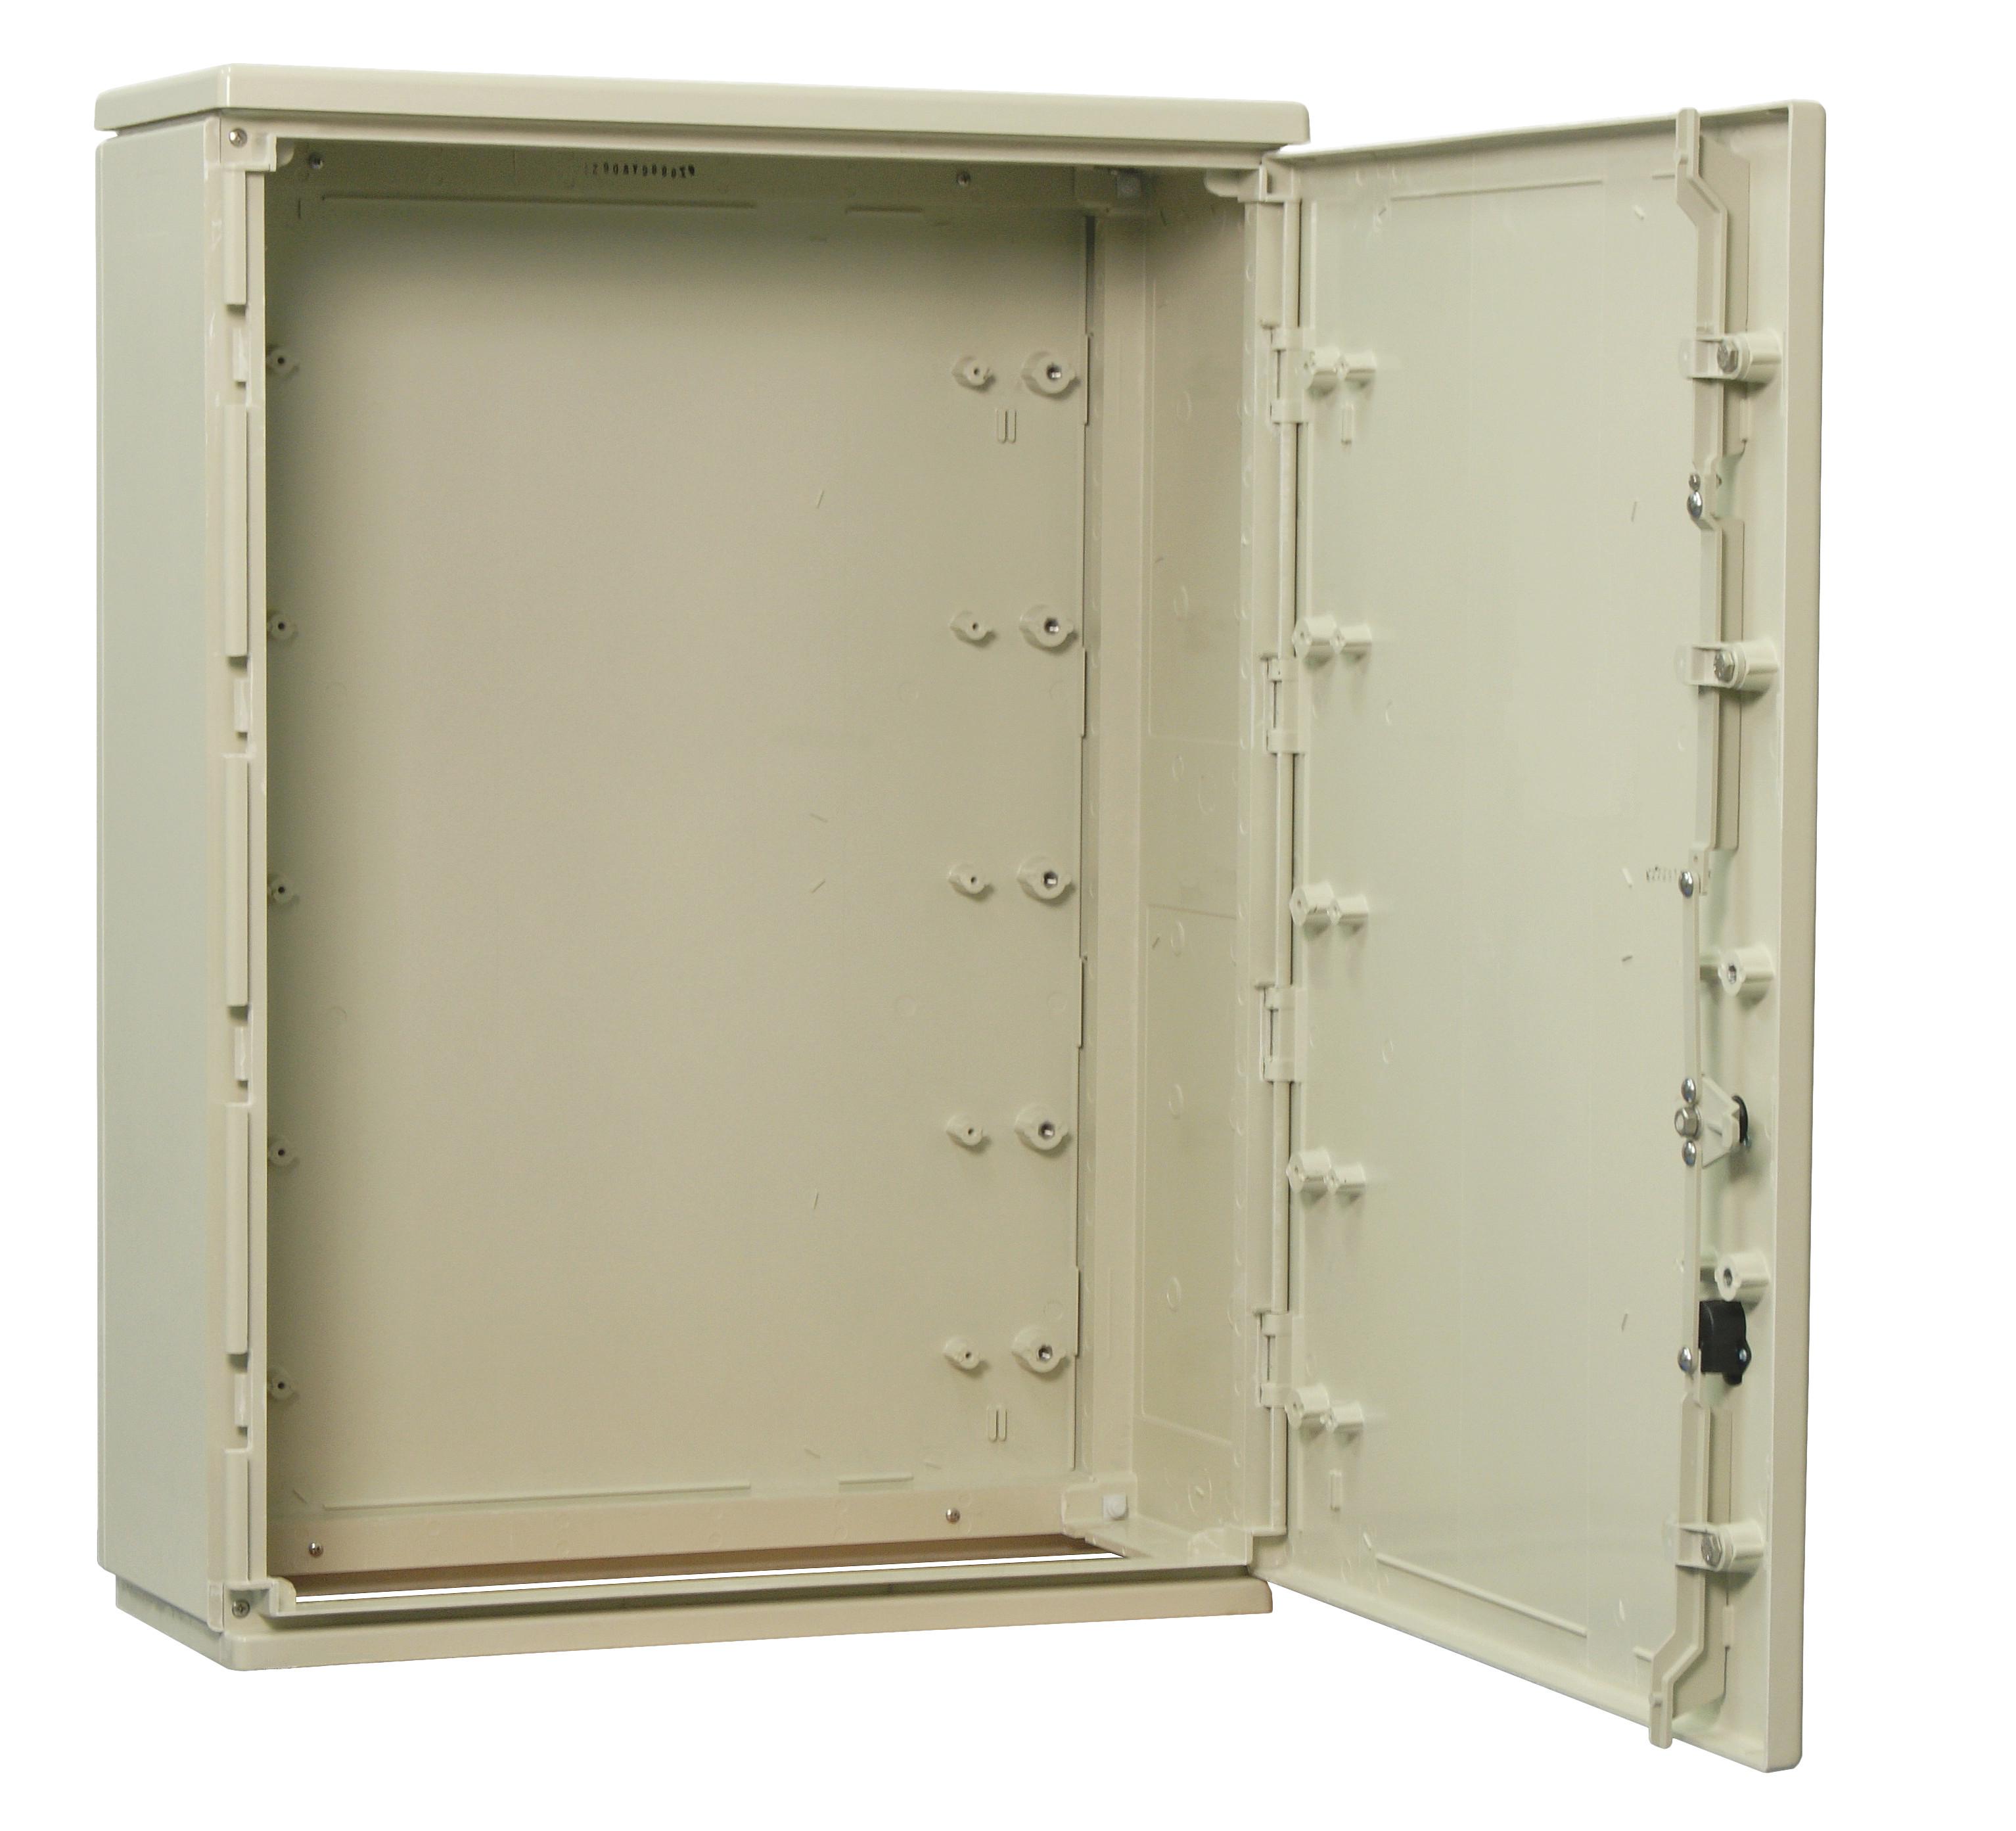 1 Stk Kabelverteilerschrank 2-türig glatt, Gr.2H, RAL7032, IP44 IG009205--